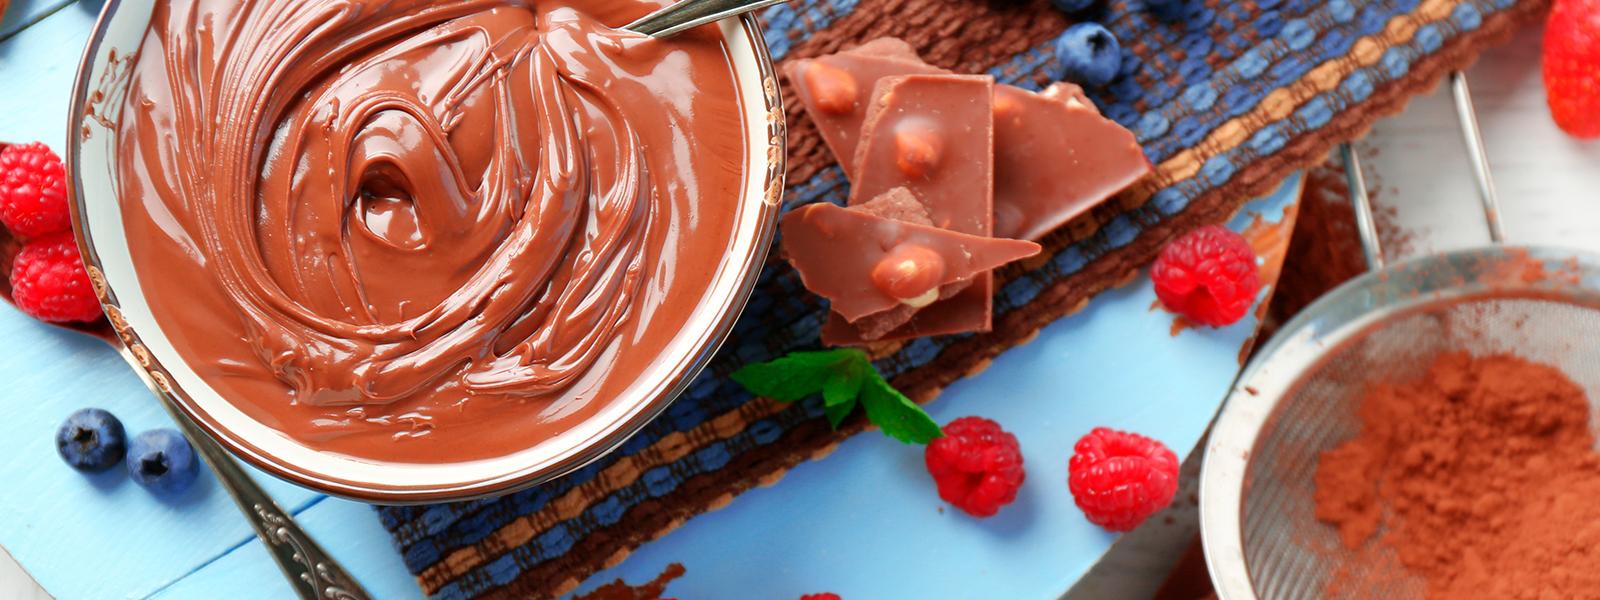 banner-carino-ingredientes-recheios-coberturas-chocolate-recheios